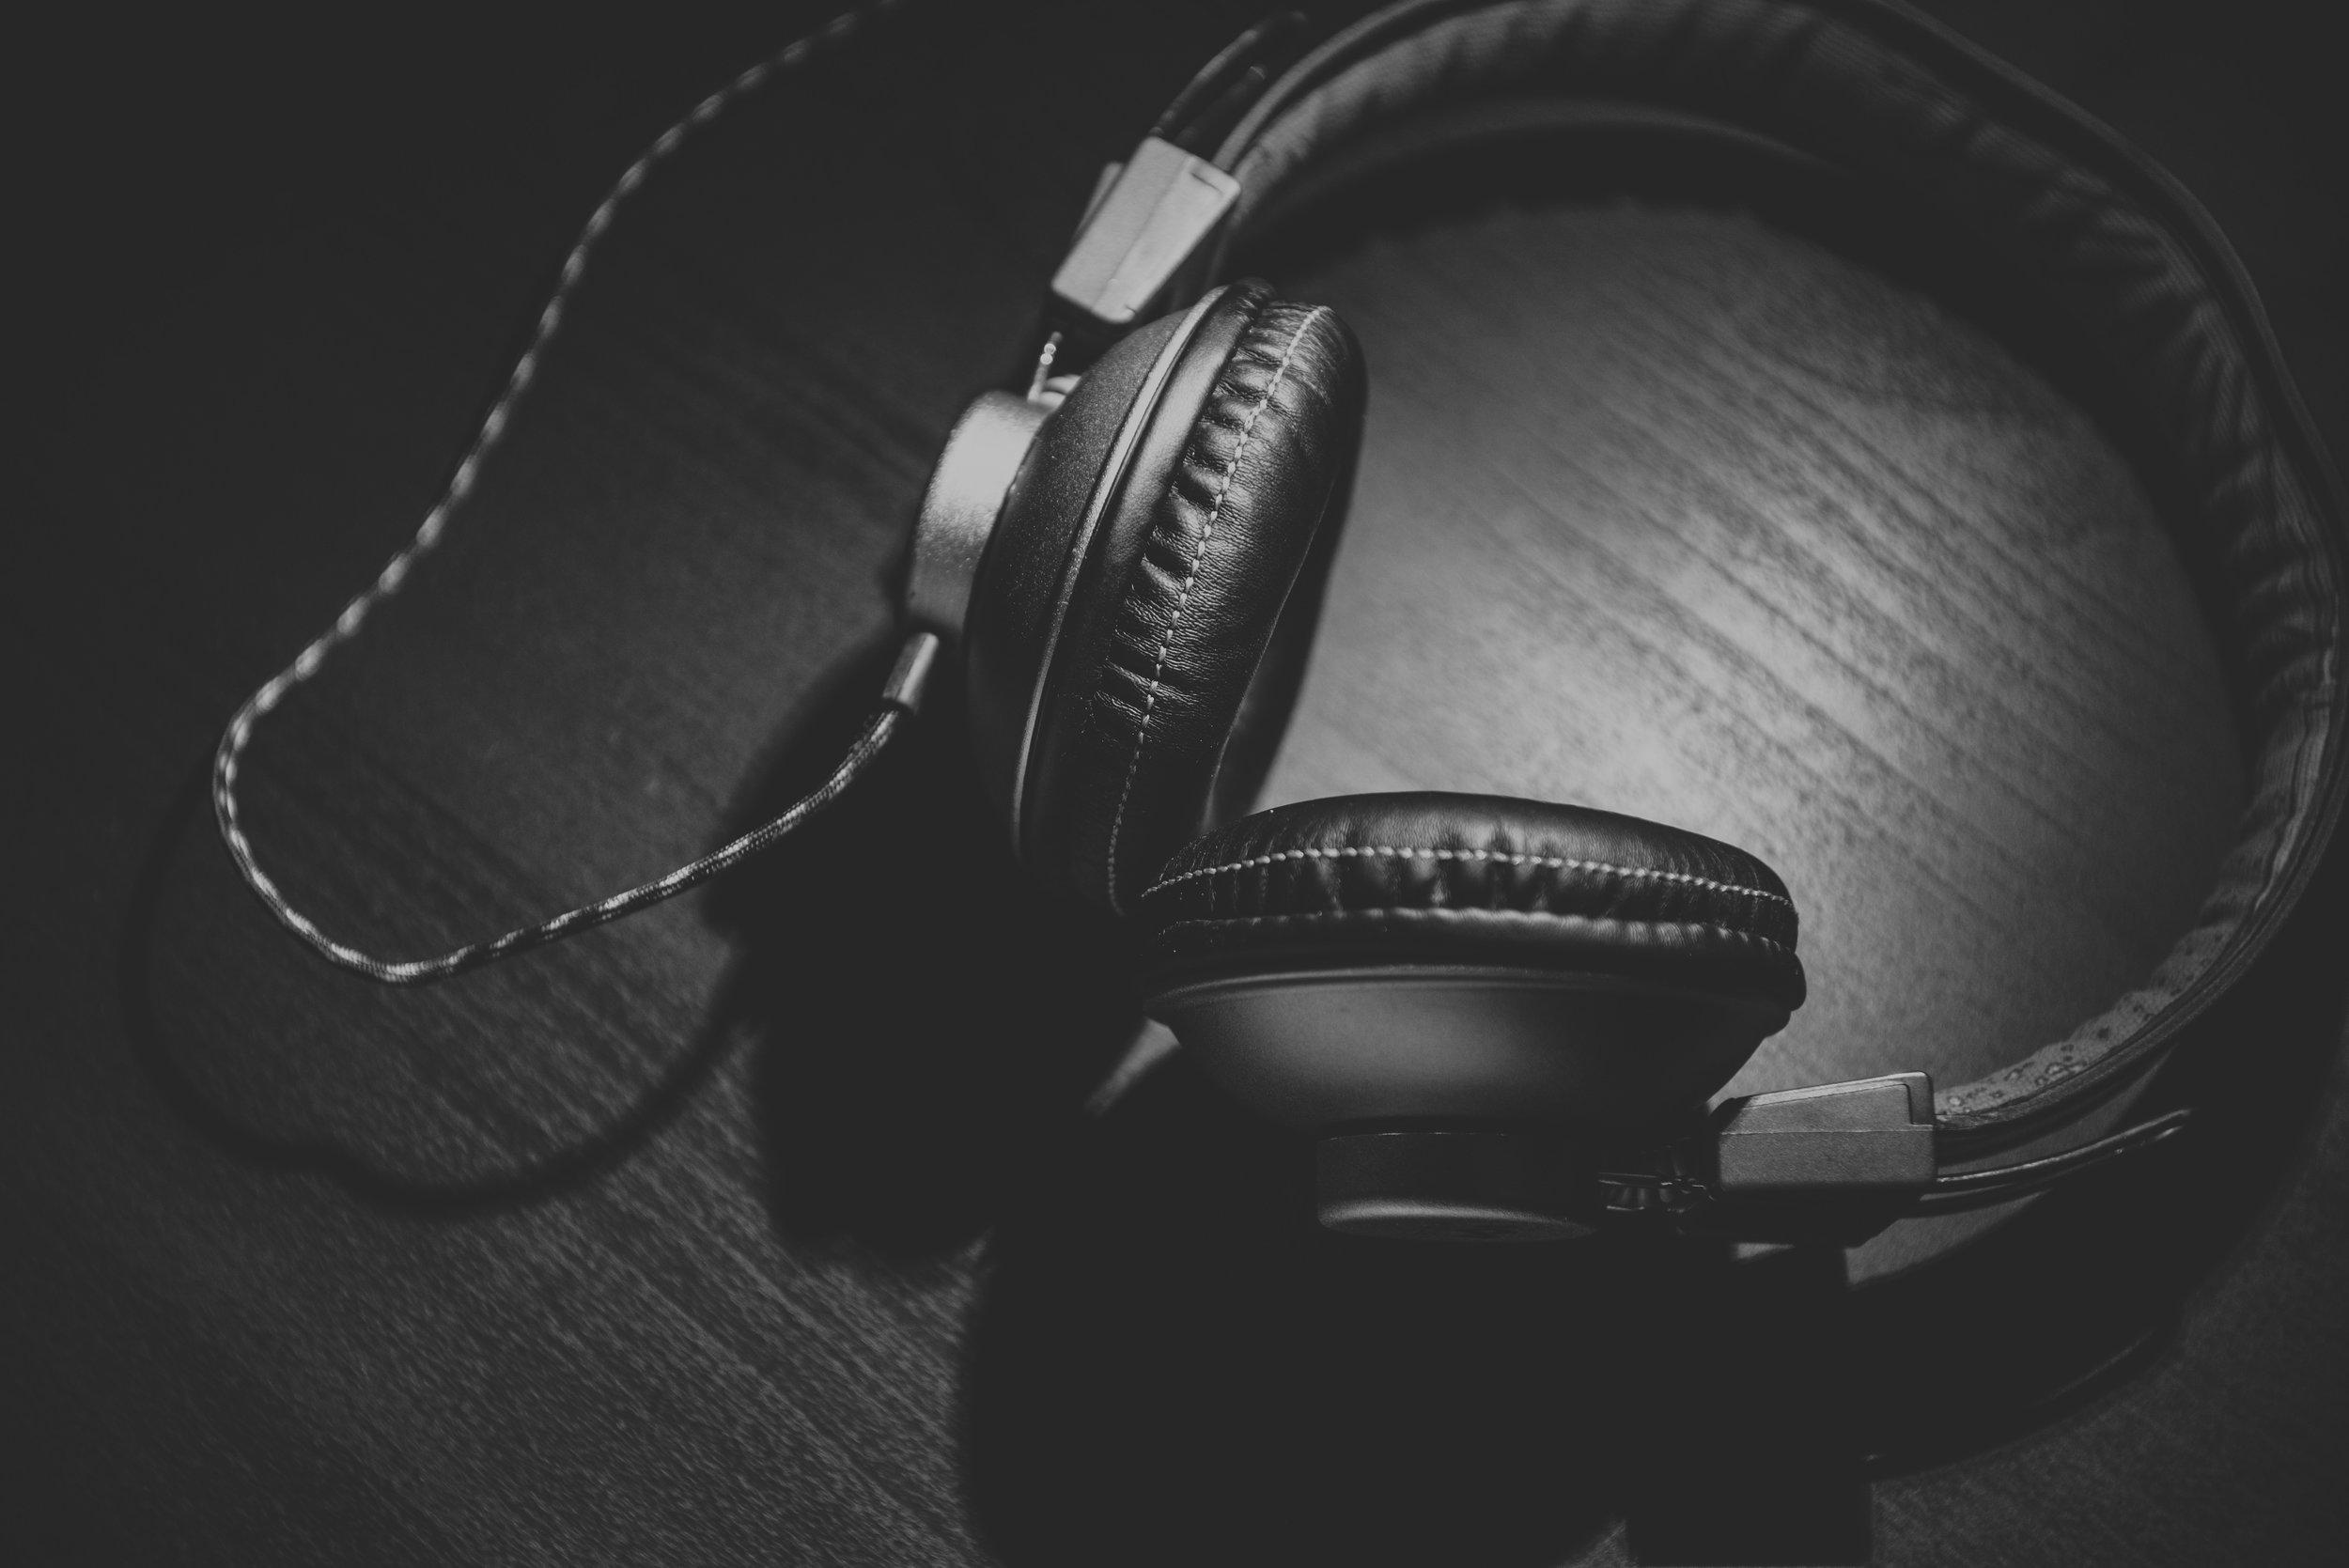 desk-music-black-and-white-technology-headphone-gadget-100901-pxhere.com.jpg